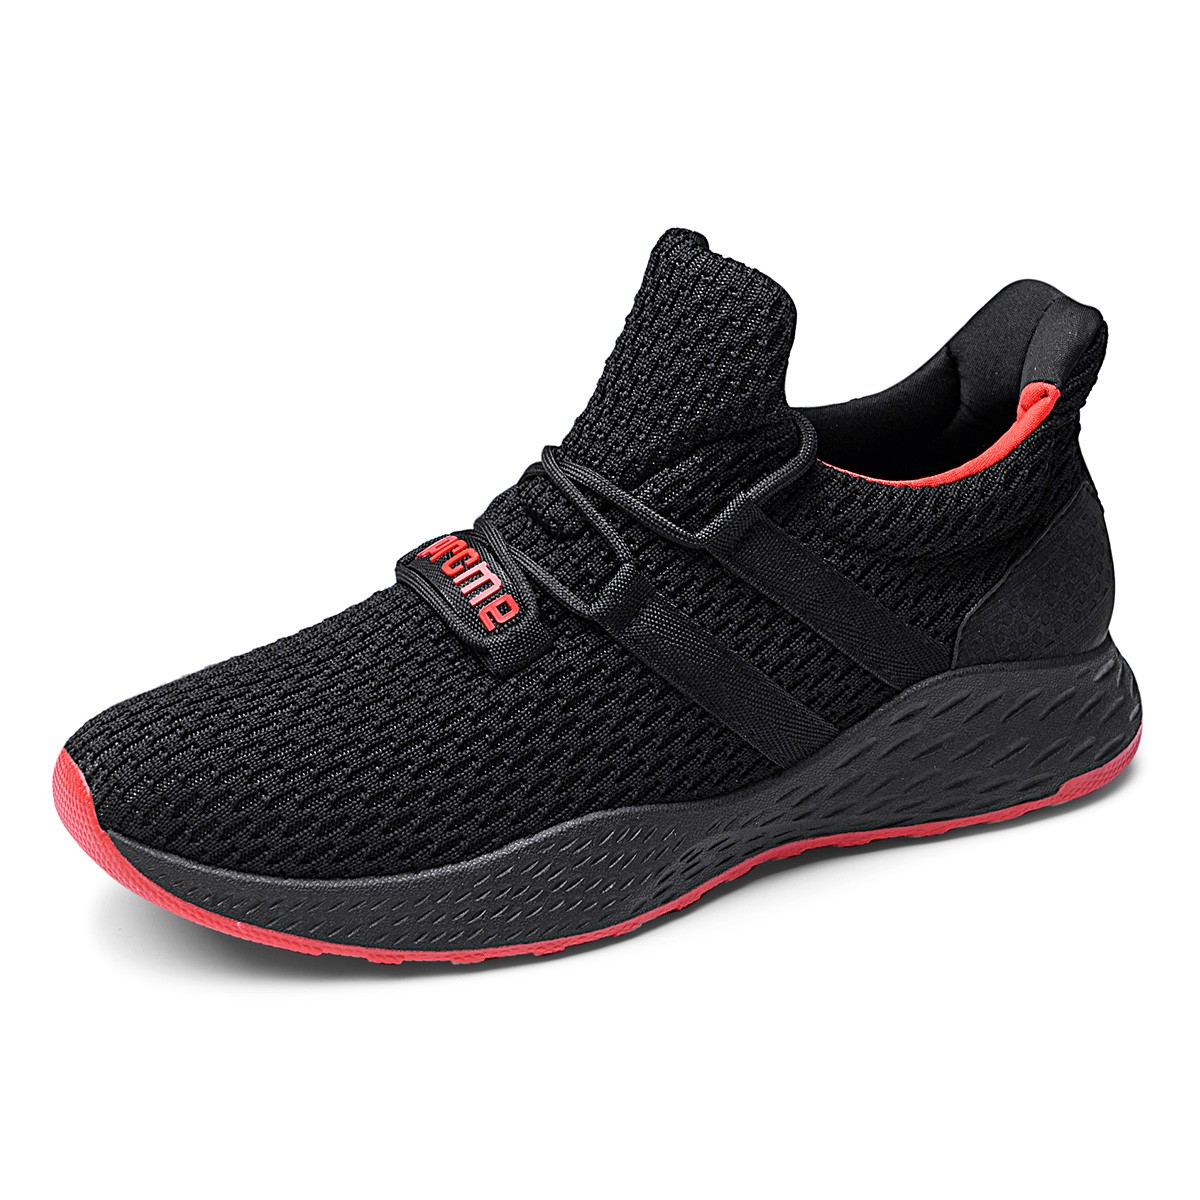 Giày sneaker thể thao nam Passo G125